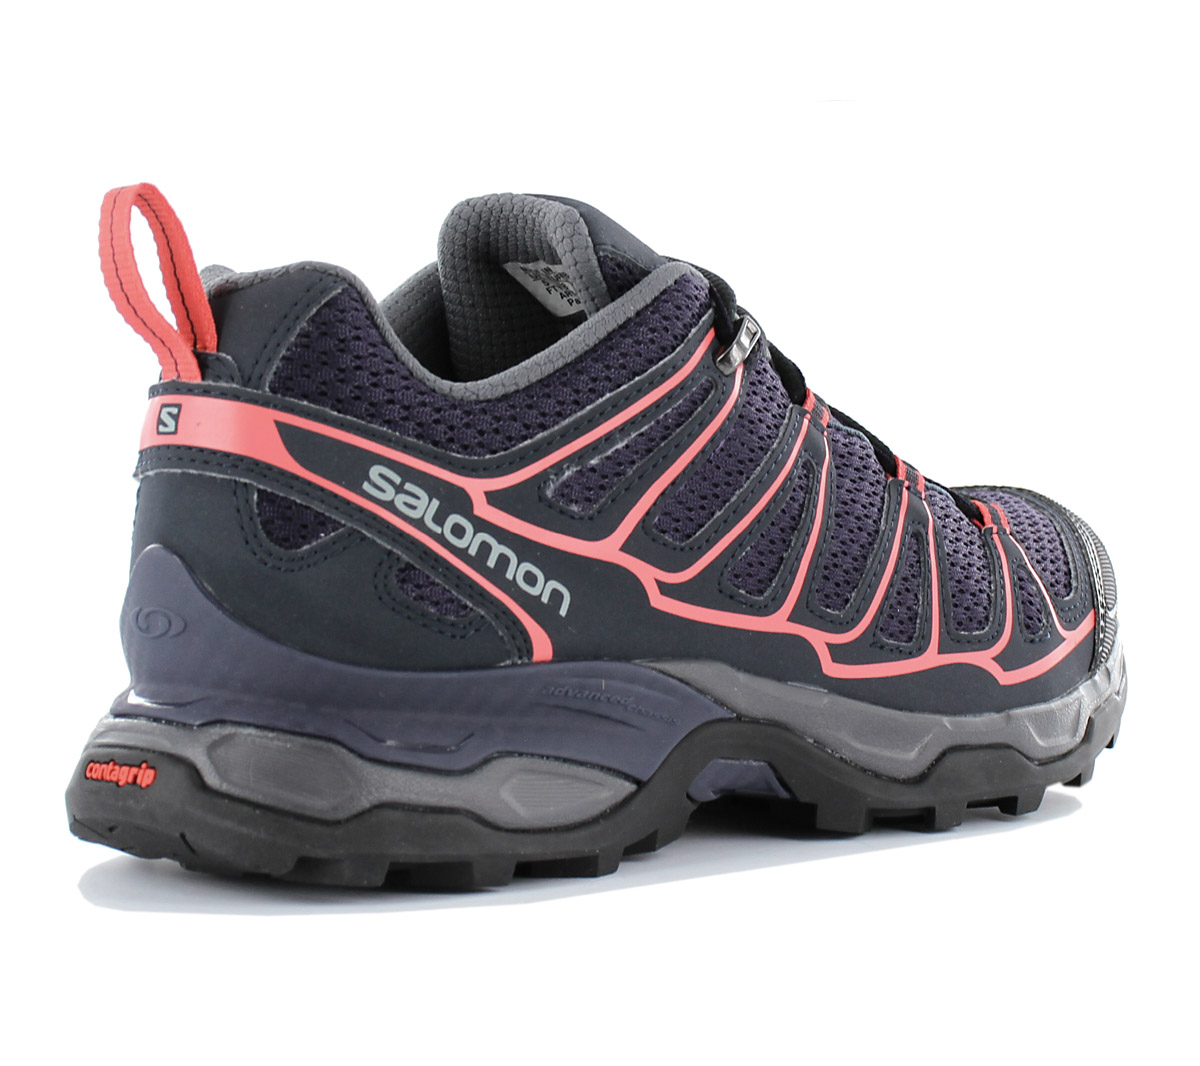 Details about Salomon x Ultra Prime W Women's Hiking Shoes Trekking Shoes Trail 391843 New